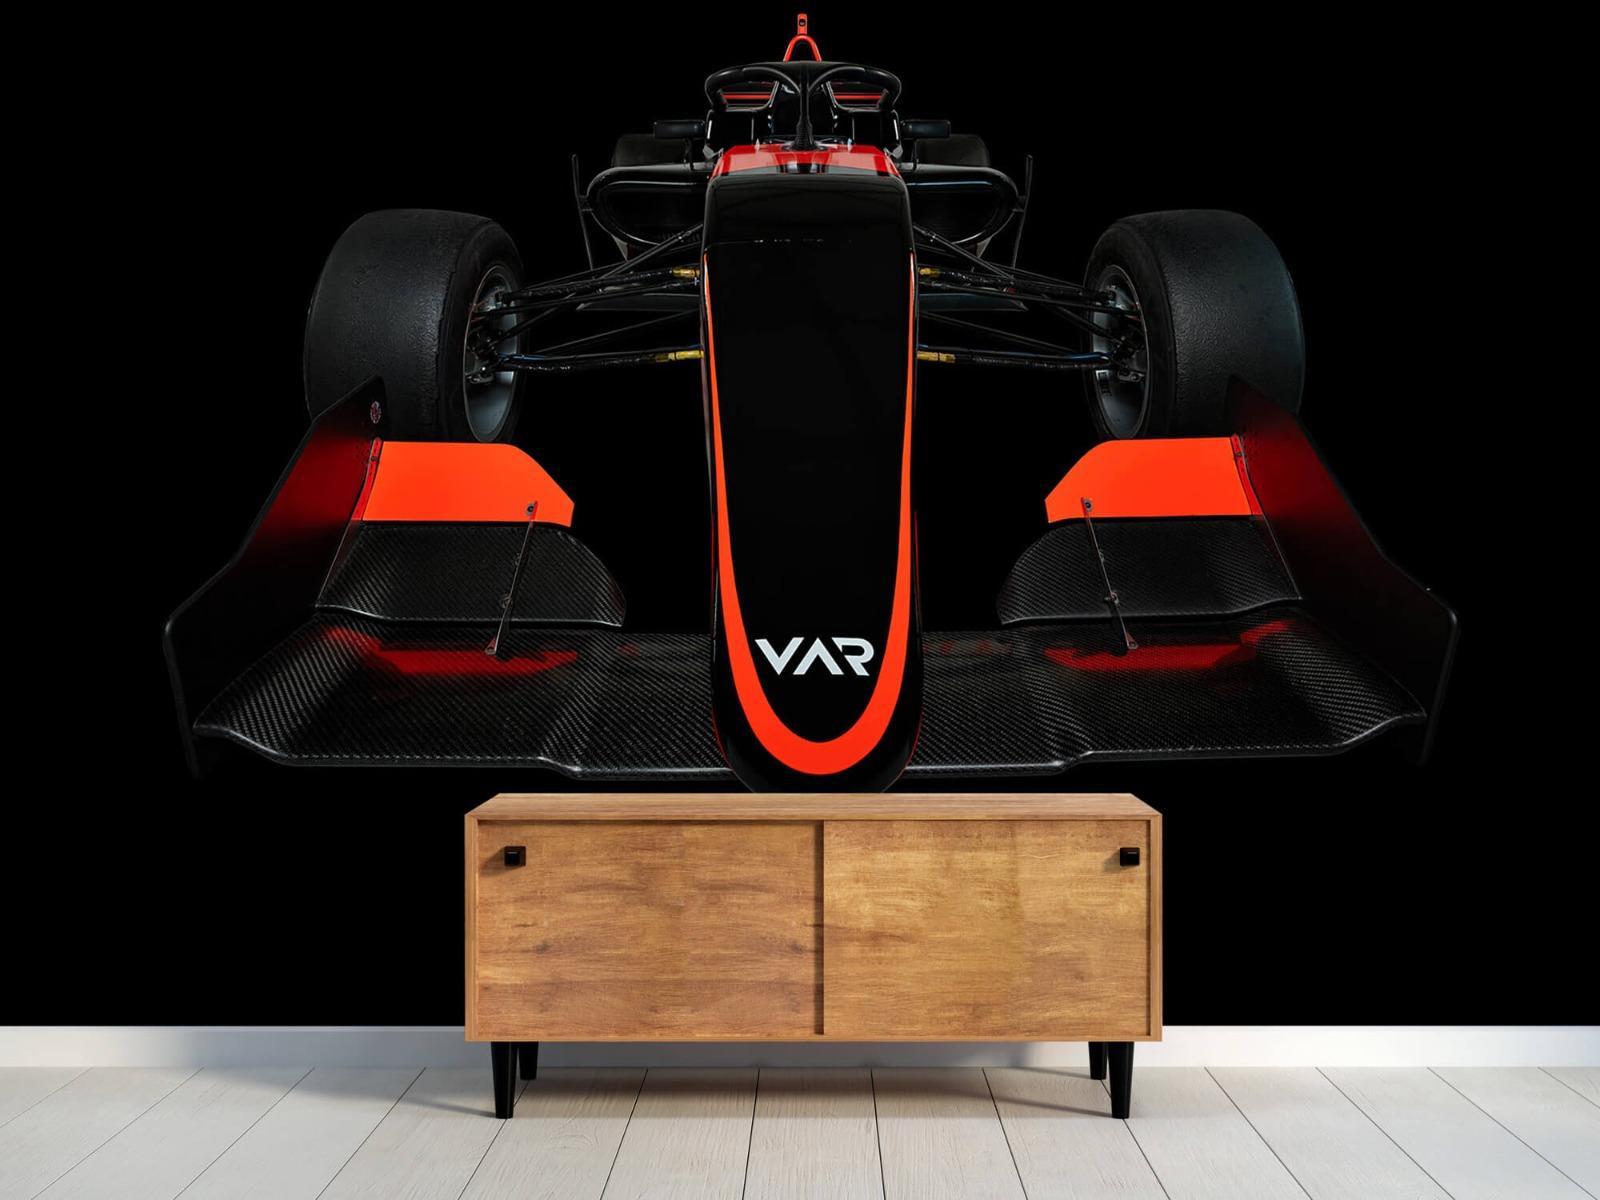 Sportauto's - Formule 3 - Lower front view - dark - Slaapkamer 10